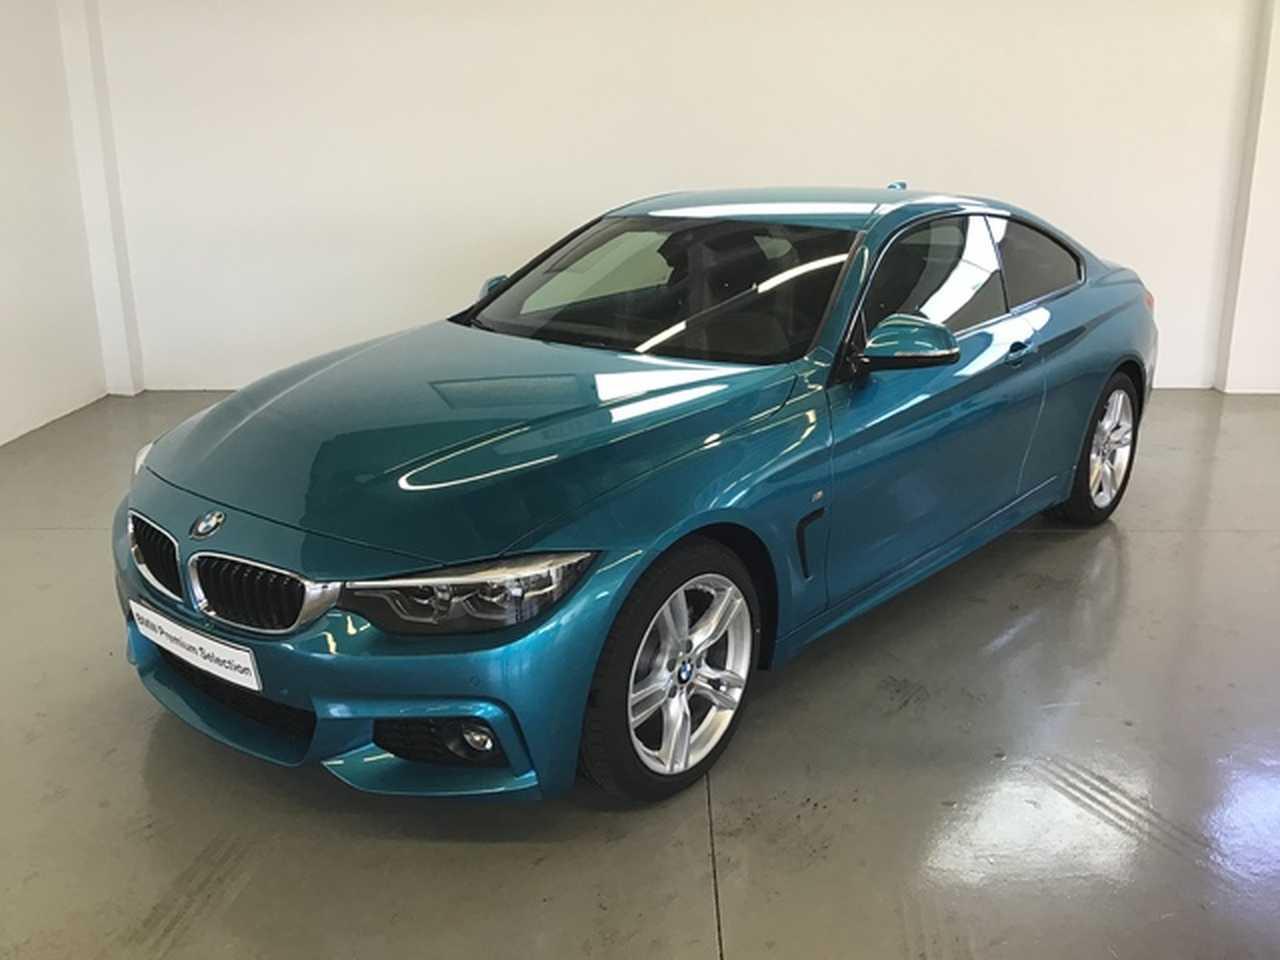 BMW Serie 4 420d Coupe 140 kW (190 CV)  - Foto 1